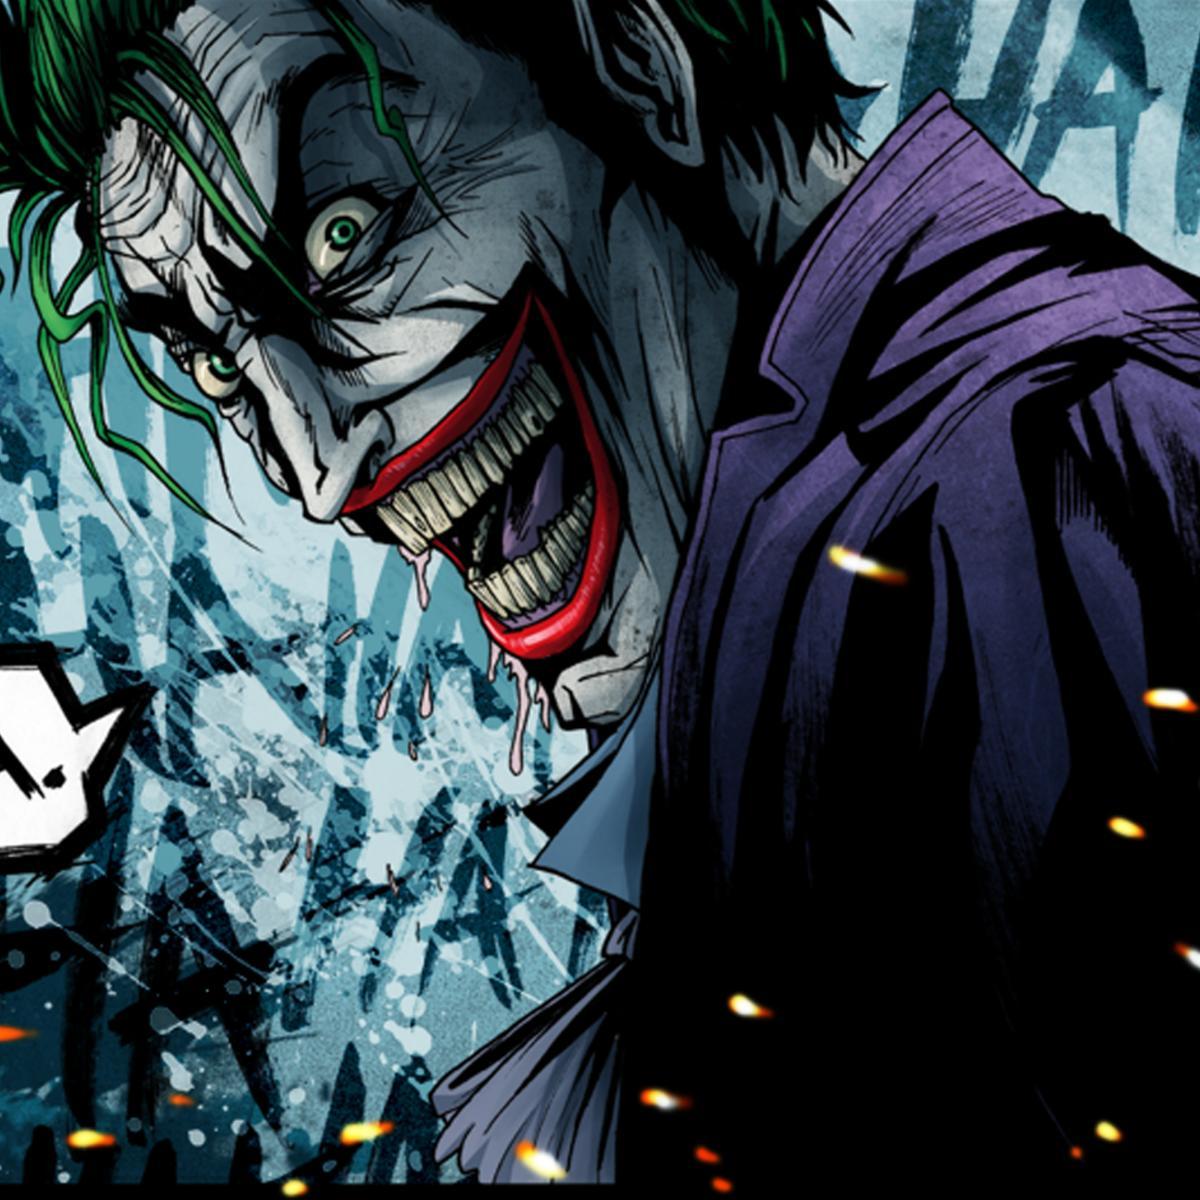 dc_comics_the_joker_artwork_laughing_desktop_1849x941_hd-wallpaper-1166005.png